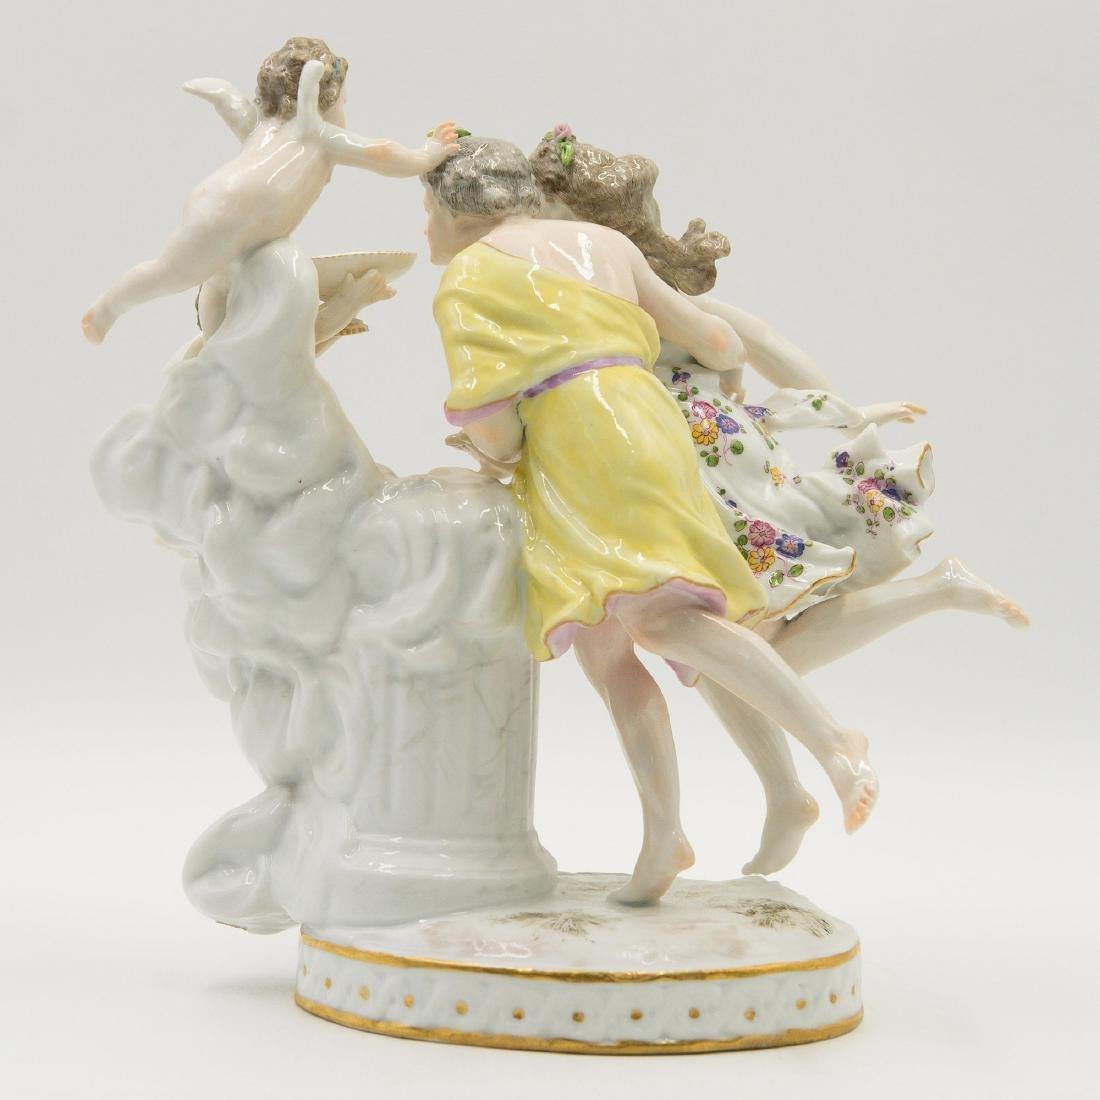 Samson French Porcelain Semi Nude Group Figurine - 2